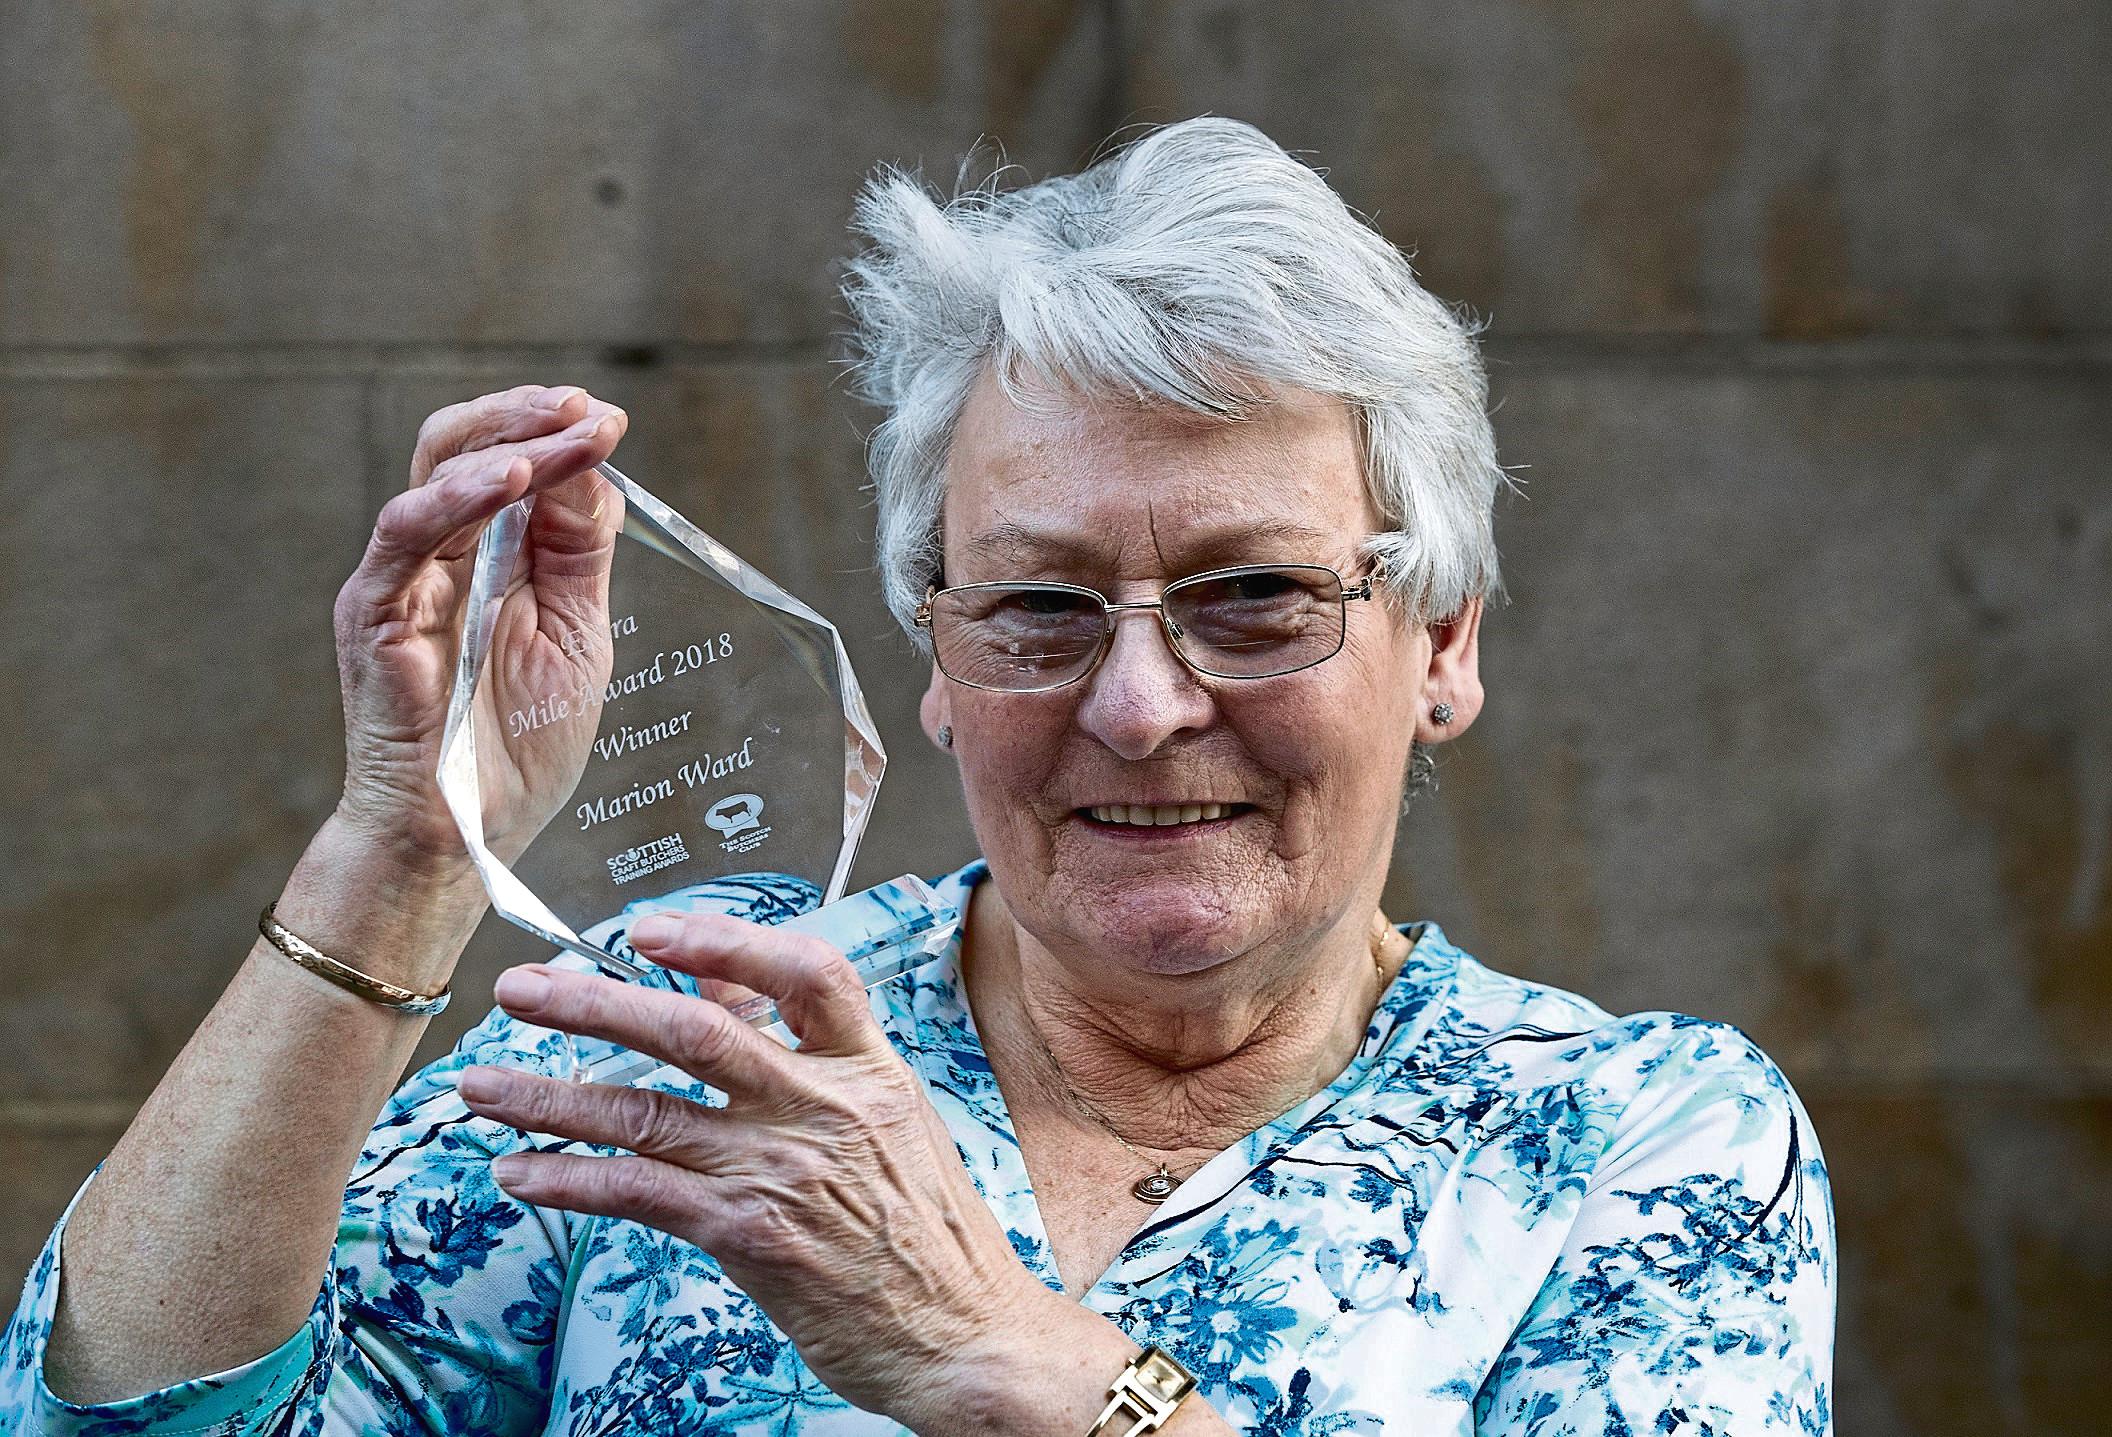 The 2018 Extra Mile Award winner, Marion Ward, from John Dawson Butchers in Muirkirk.